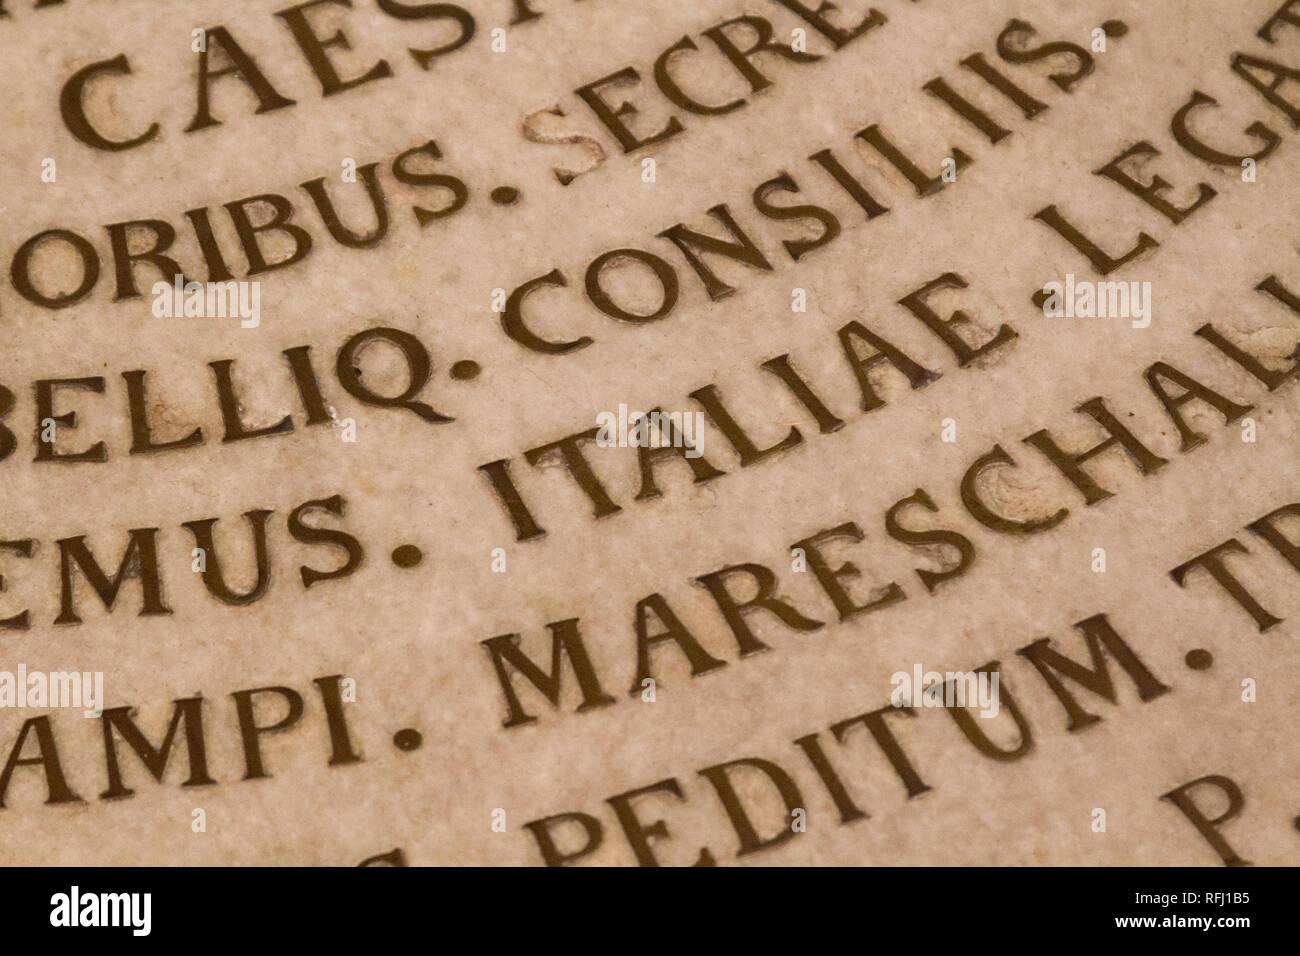 Pavia, Italy. November 16 2017. Latin inscriptions on the floor in the 'Chiesa dei Santi Gervasio e Protasio Martiri' - Stock Image